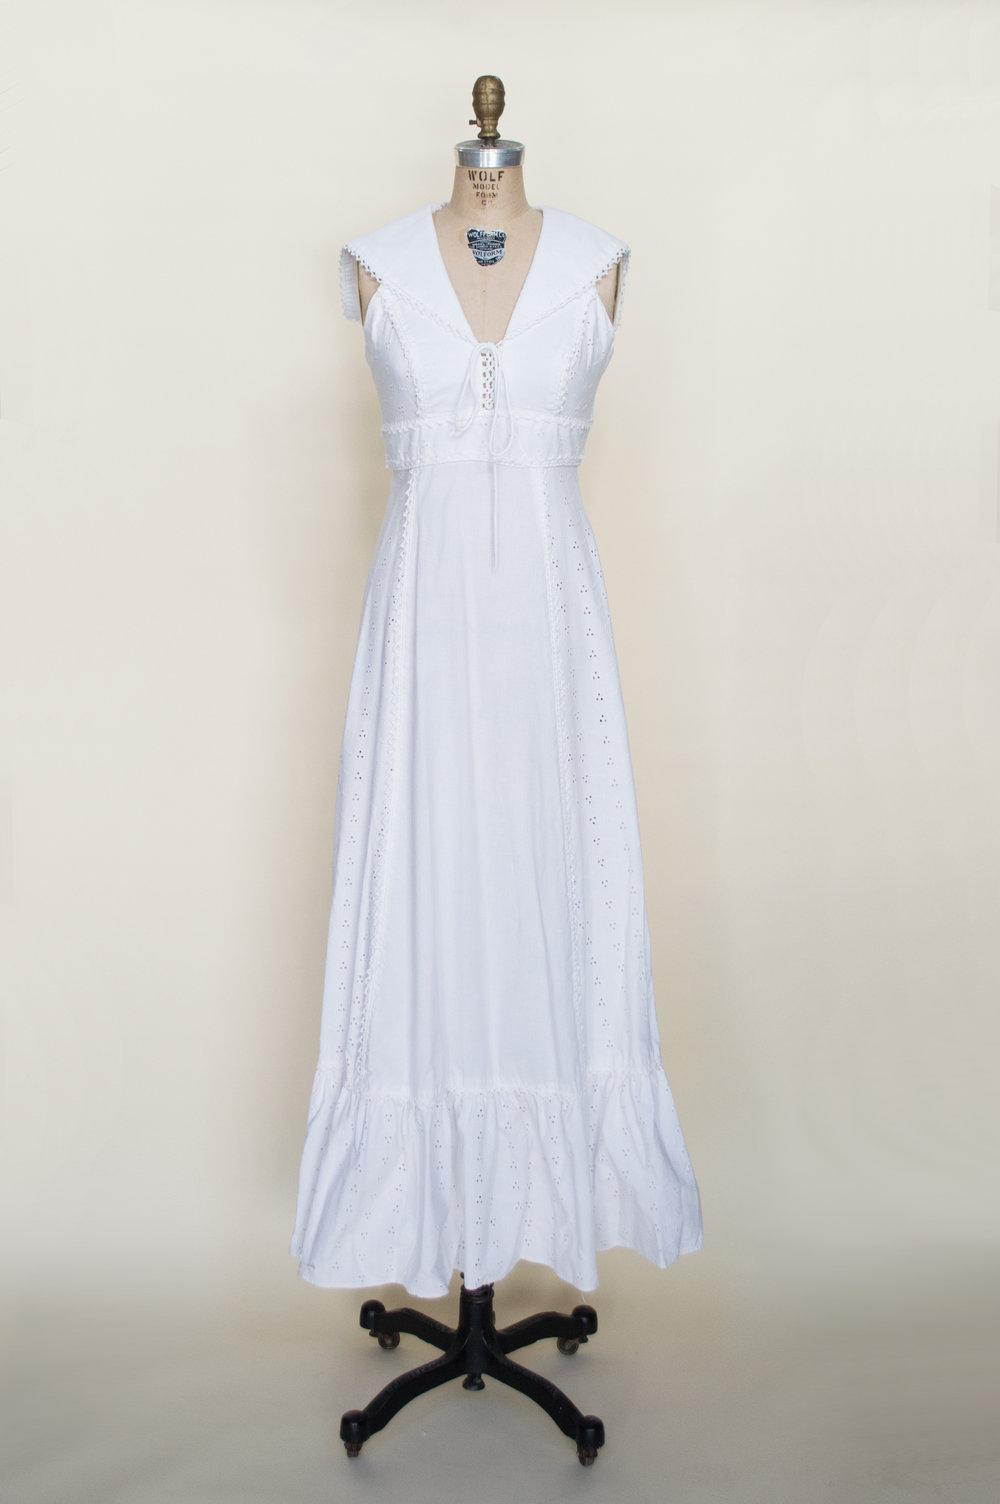 Sailorette dress vintage clothing store online austin for Vintage wedding dresses austin